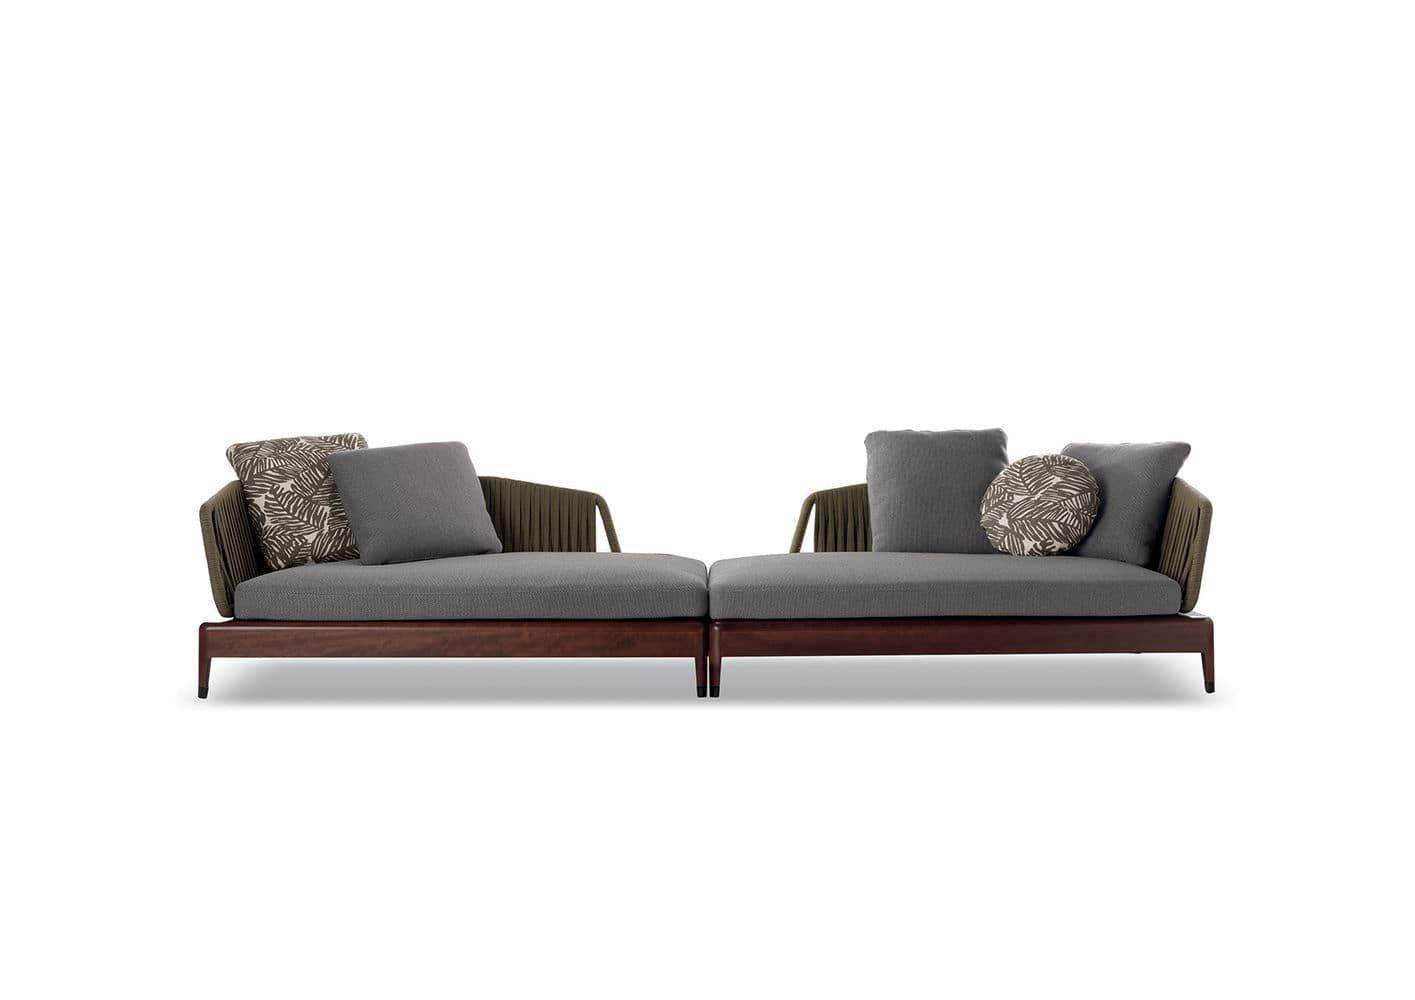 Modular Sofa Contemporary Outdoor Fabric Indiana Minotti